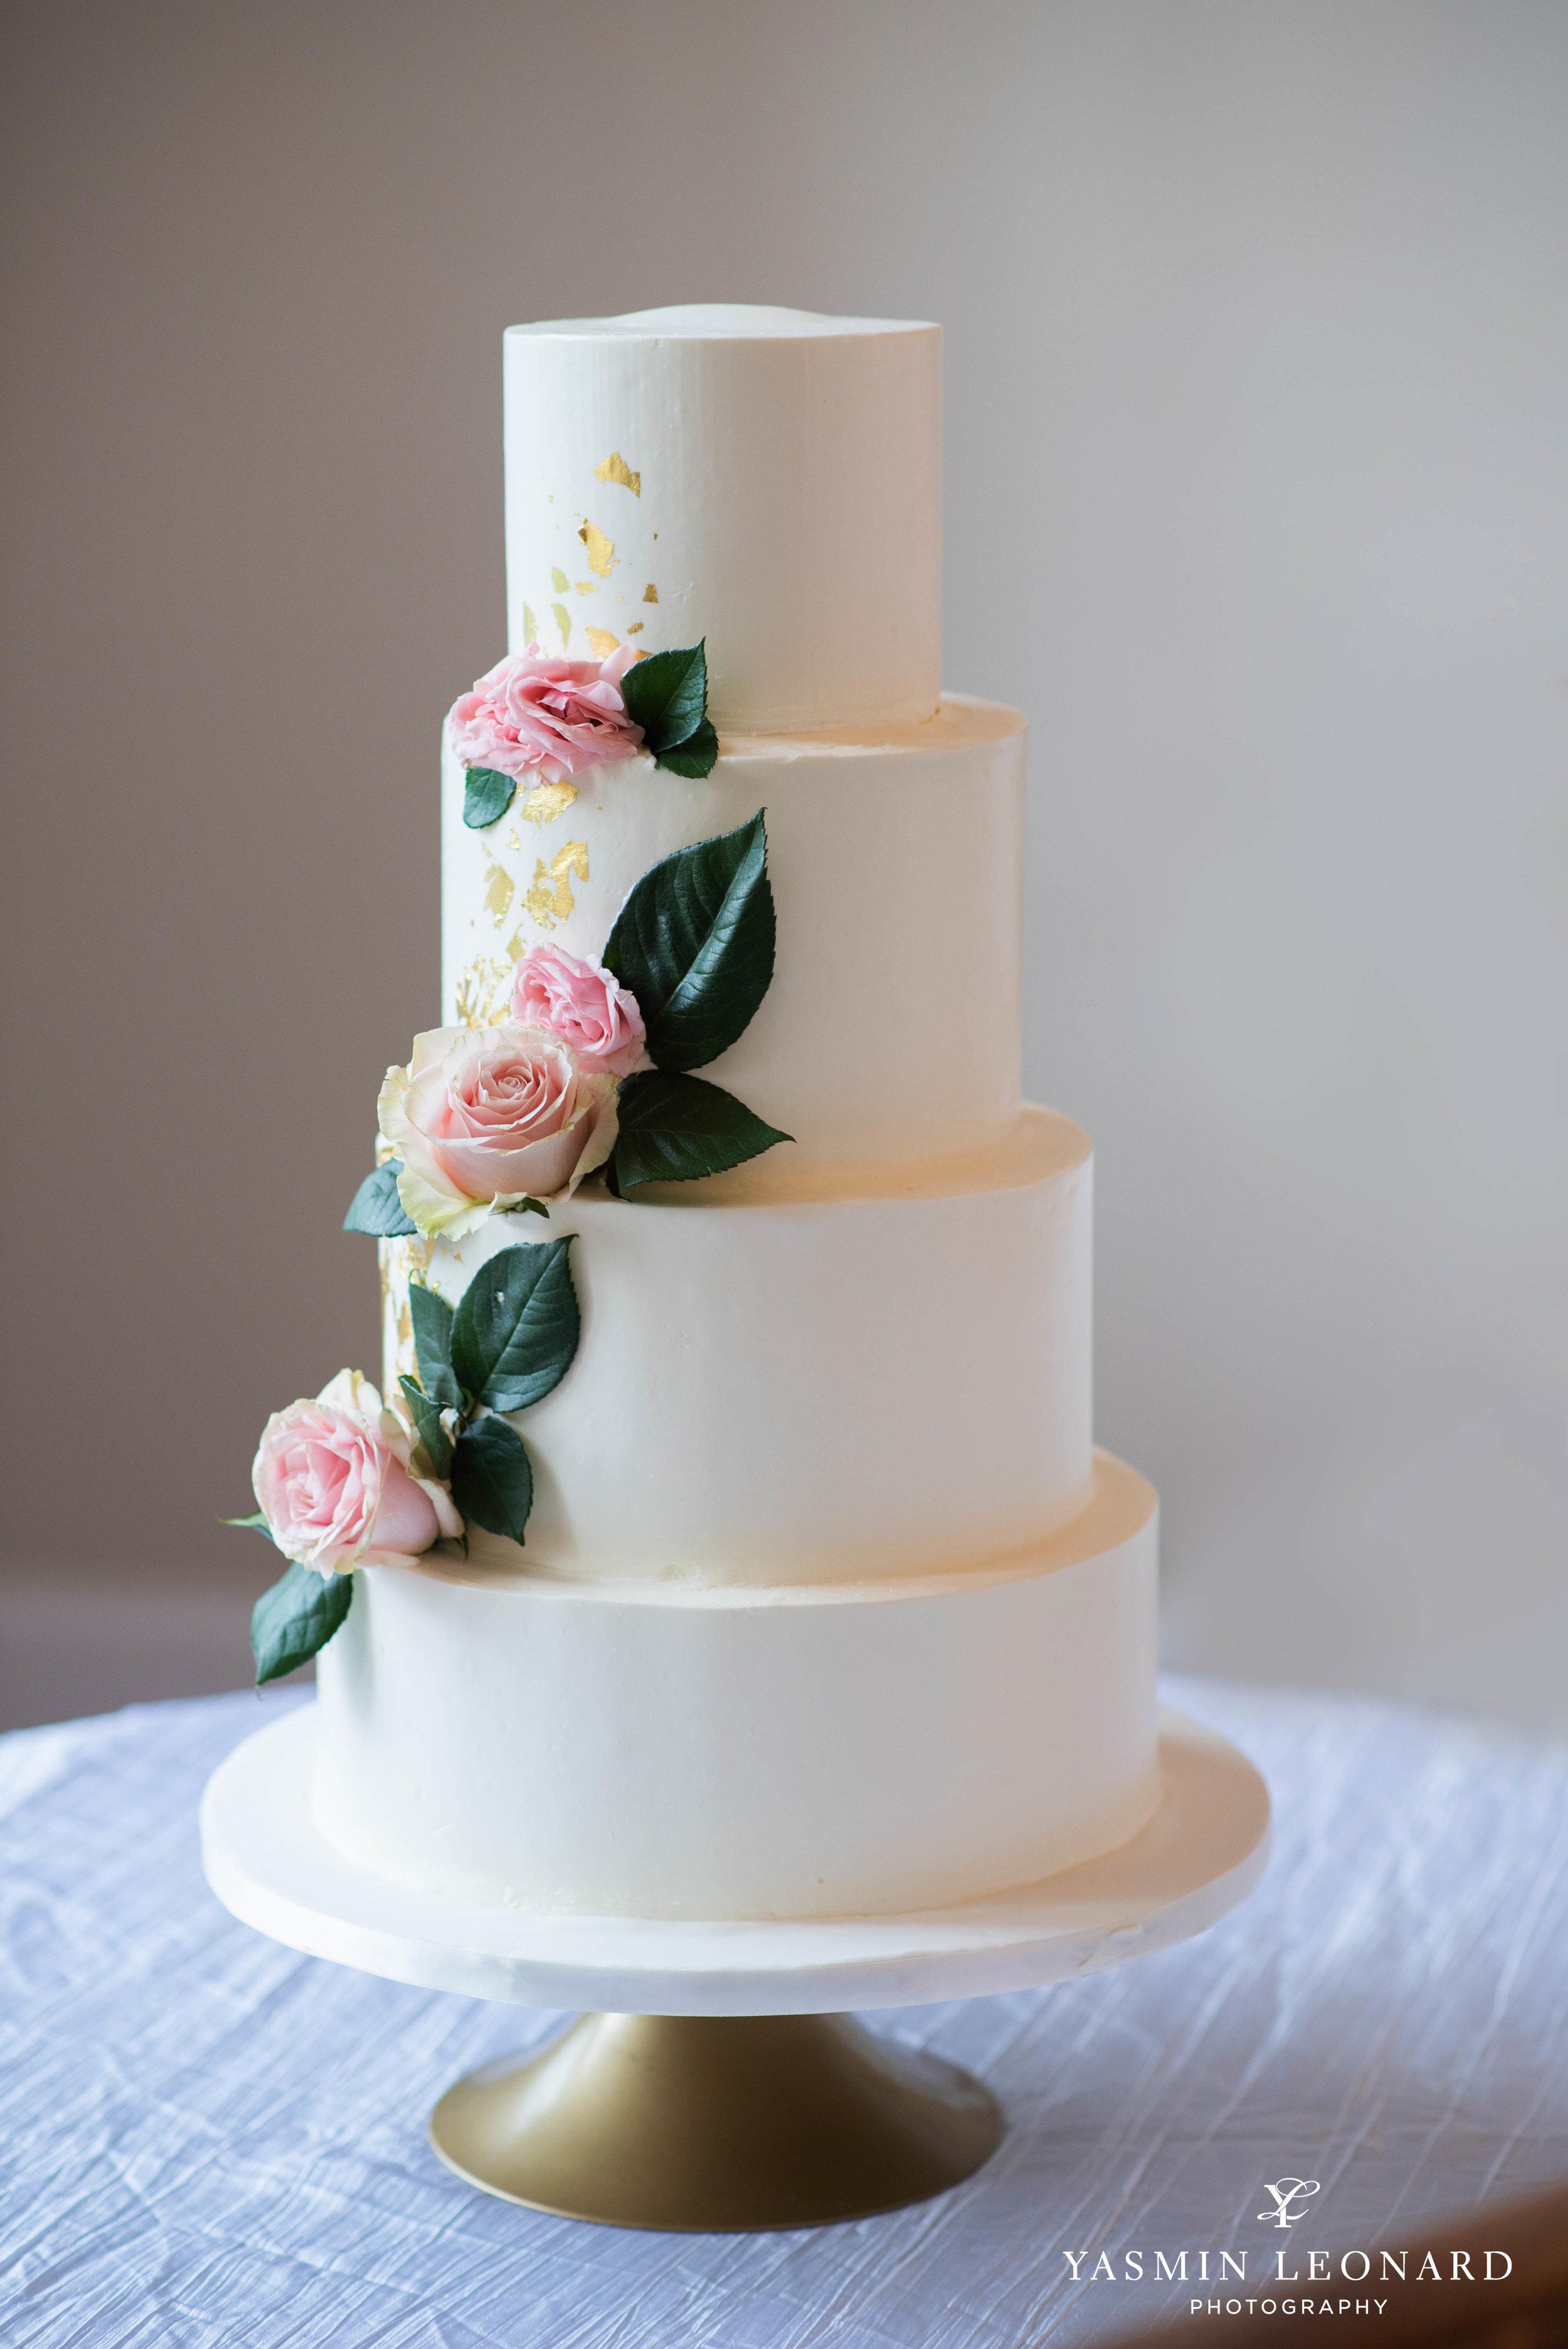 Separk Mansion - NC Weddings - Gastonia Wedding - NC Wedding Venues - Pink and Blue Wedding Ideas - Pink Bridesmaid Dresses - Yasmin Leonard Photography-2.jpg